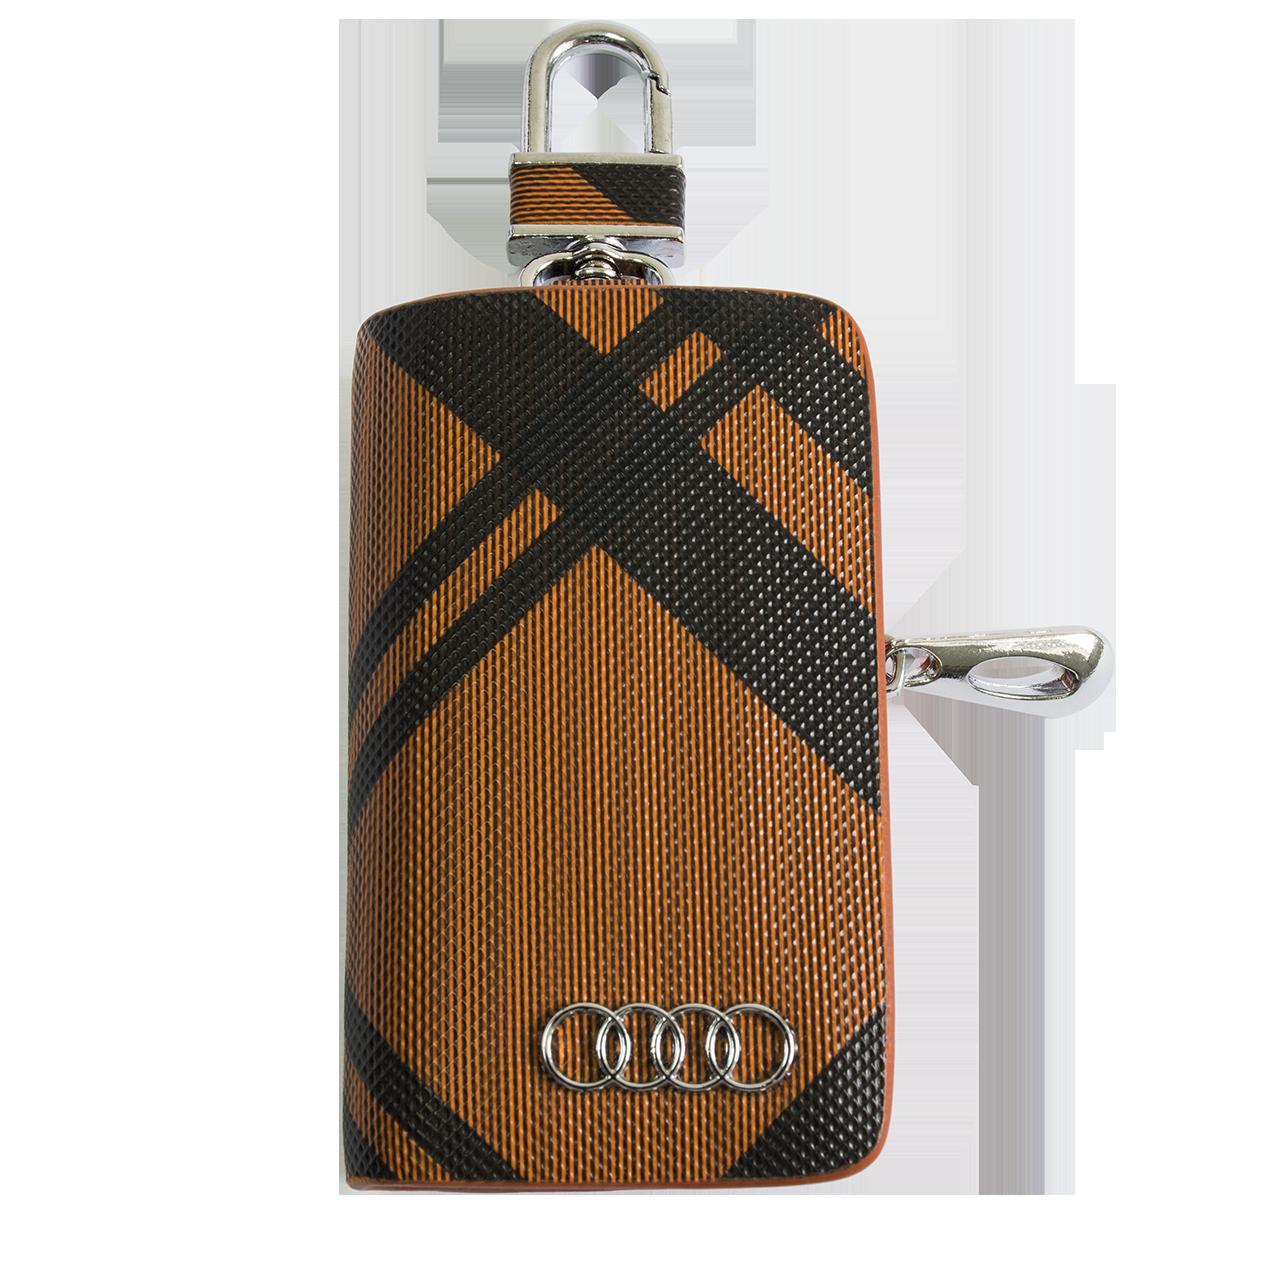 Ключница Carss с логотипом AUDI 01014 карбон коричневый